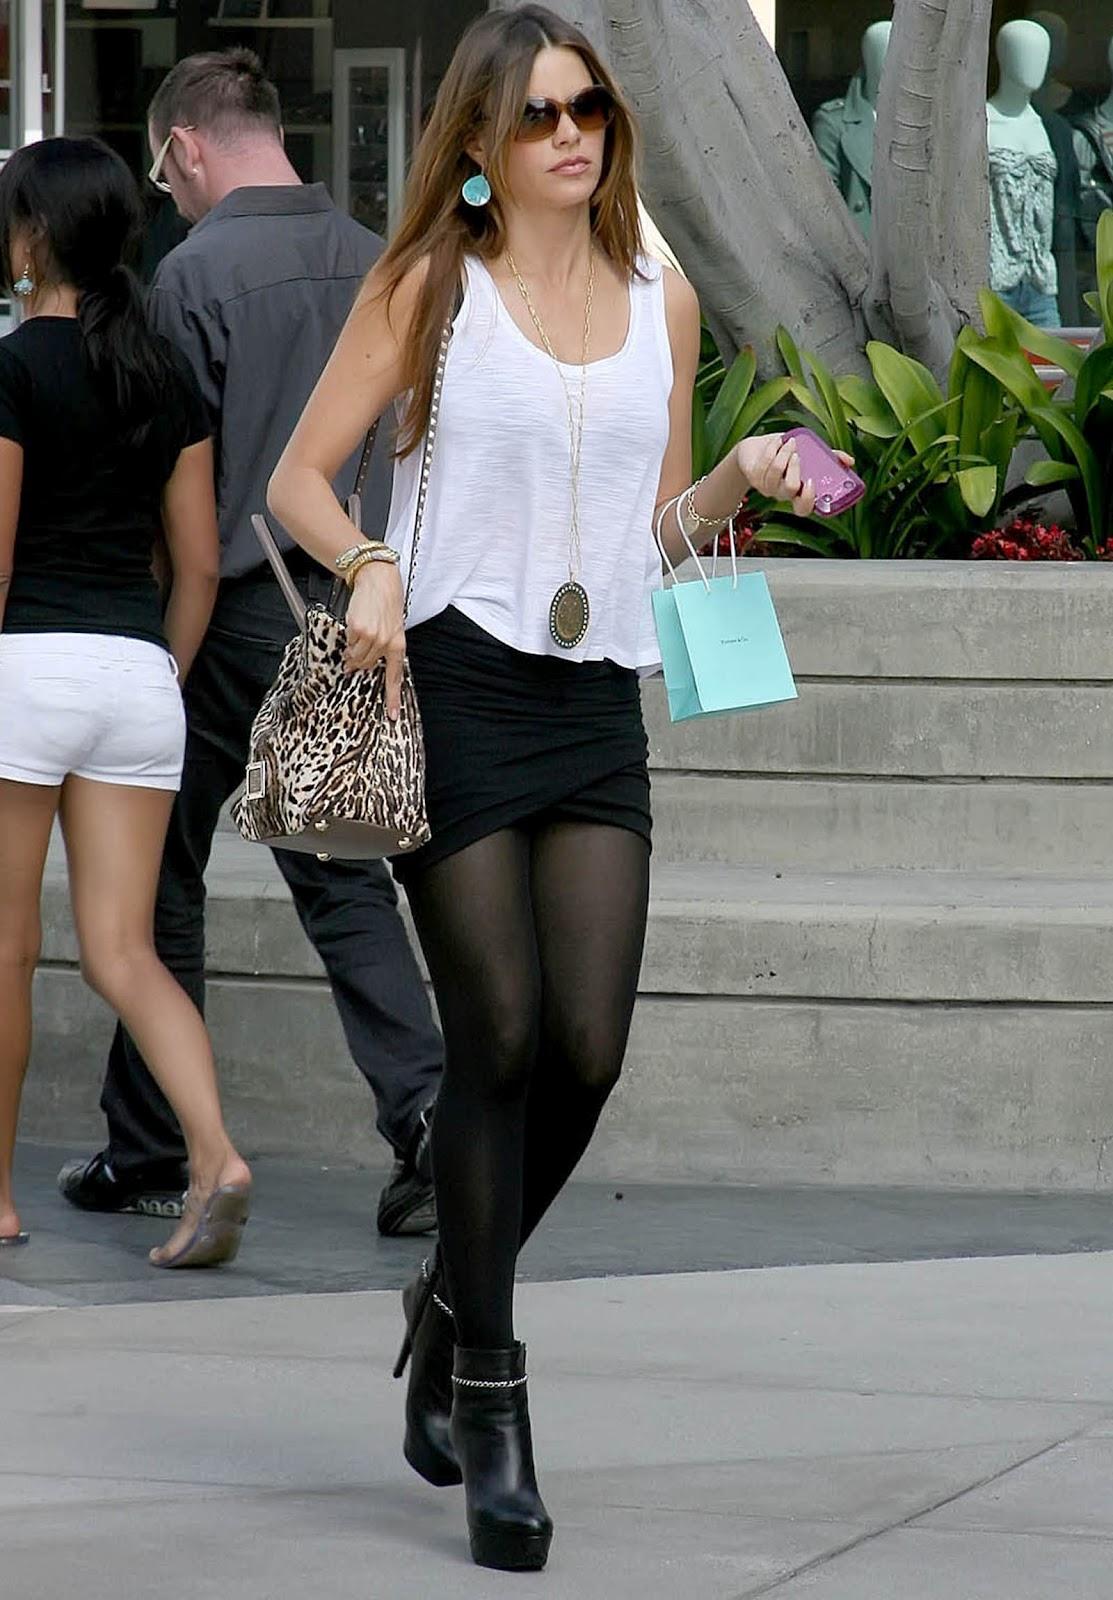 http://1.bp.blogspot.com/-TIHVLX355ts/UAmJNnb1KmI/AAAAAAAAIvI/tRXNGXldmtg/s1600/sofia_vergara_legs_skirt.jpg